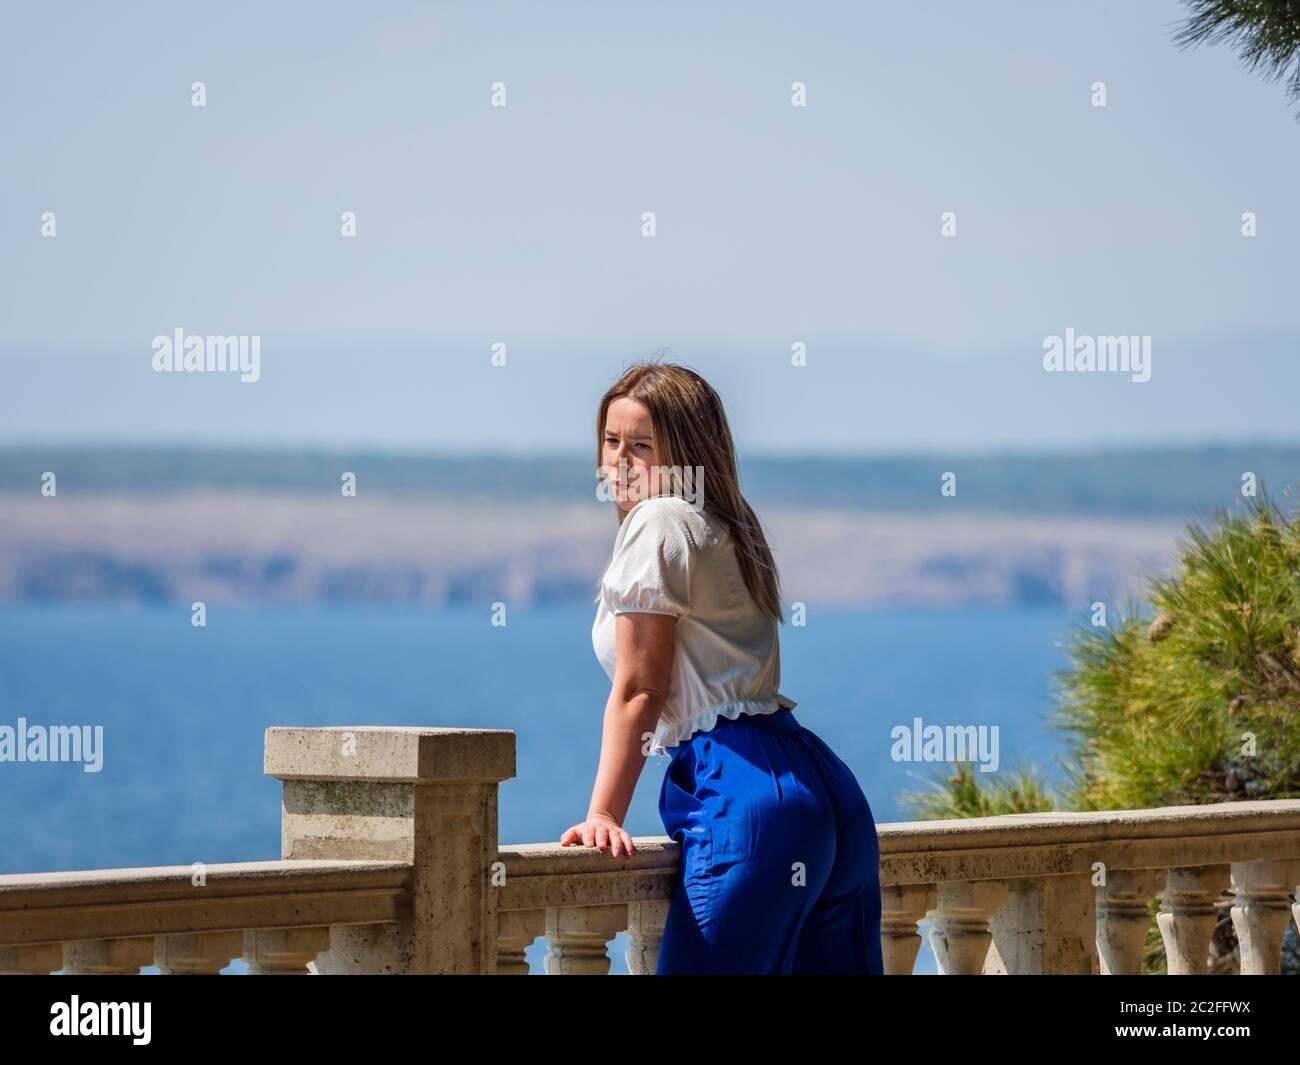 Teengirl standing by fence overlooking sea seaside looking away watching on watch looking at camera eyeshot eye eyes contact Stock Photo